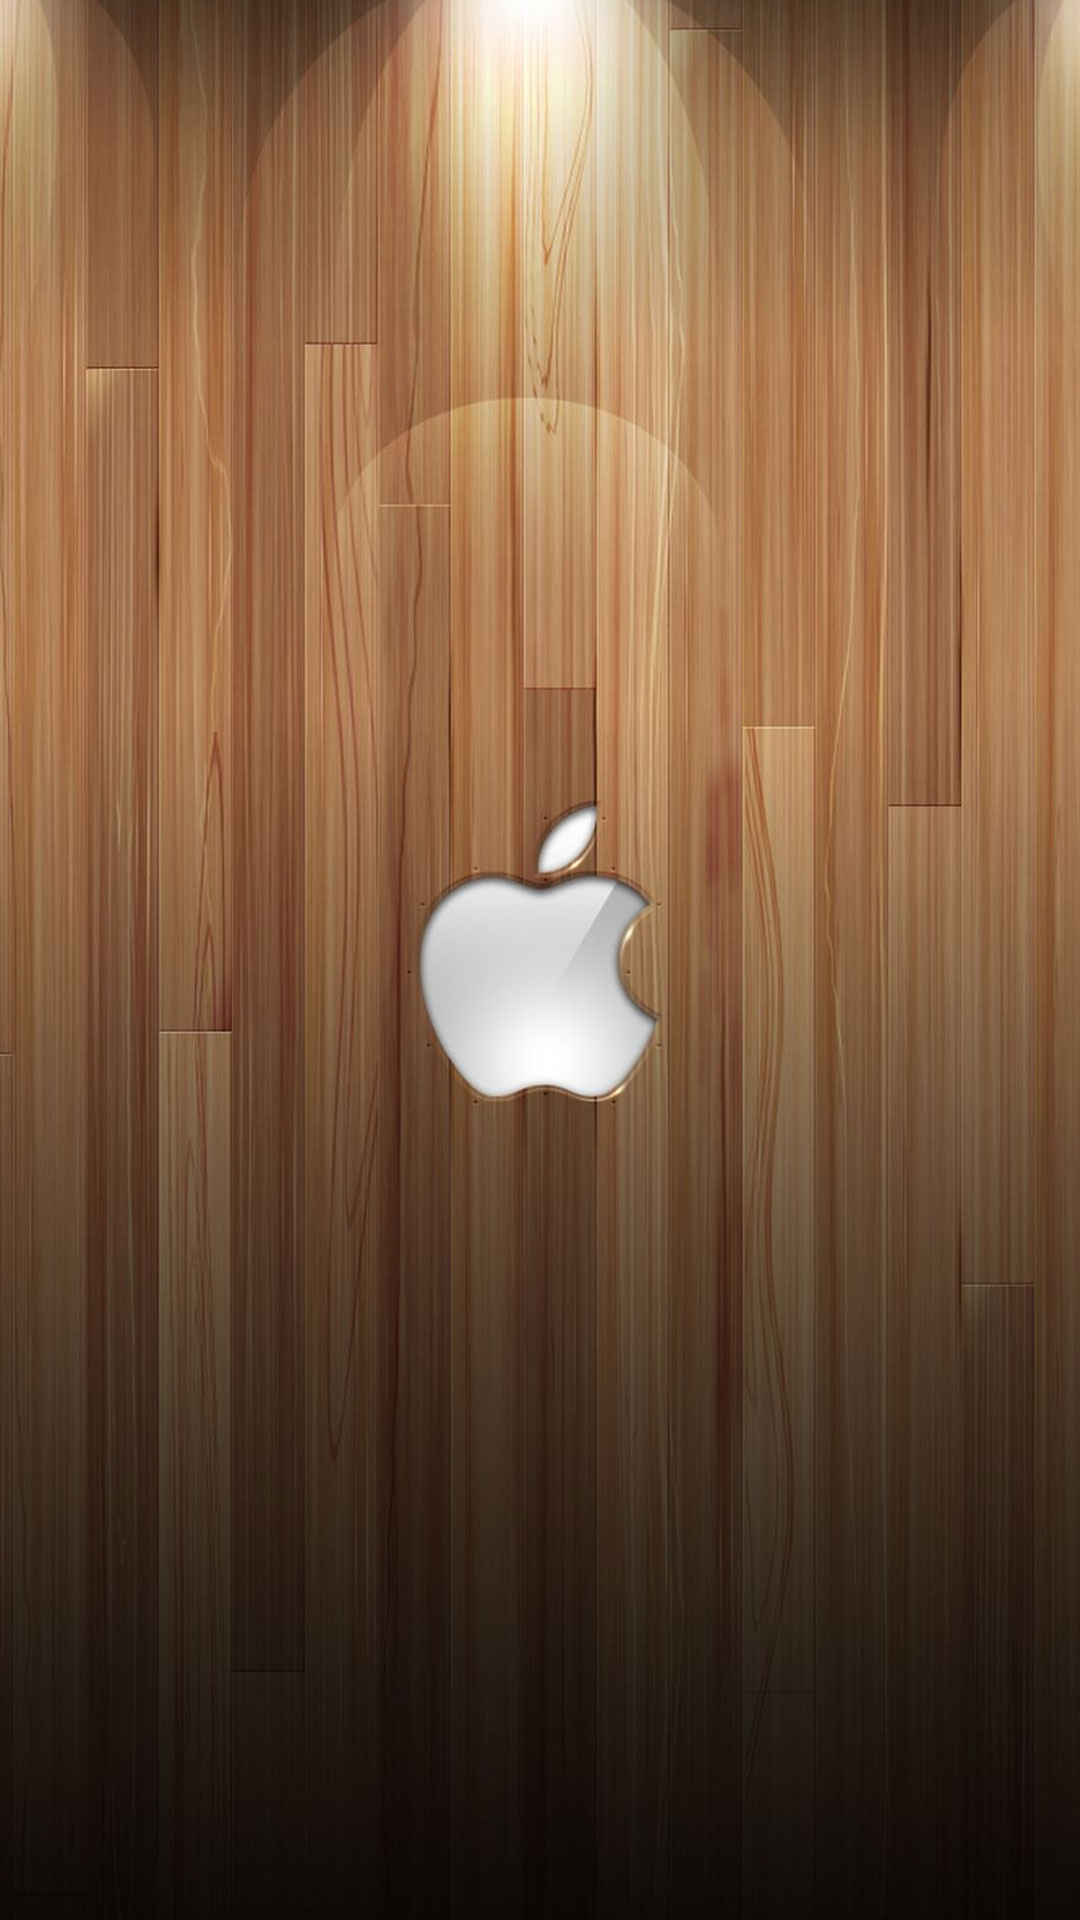 Free Download Beautiful Apple Iphone 6 Plus Wallpaper Retina Ready